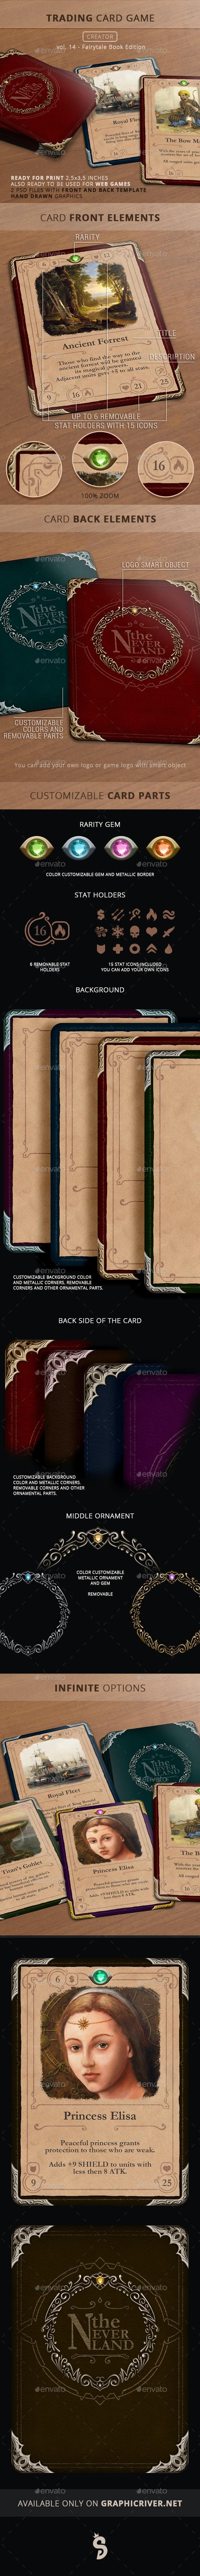 Trading Card Game Creator - Vol 14 - Fairytale Book